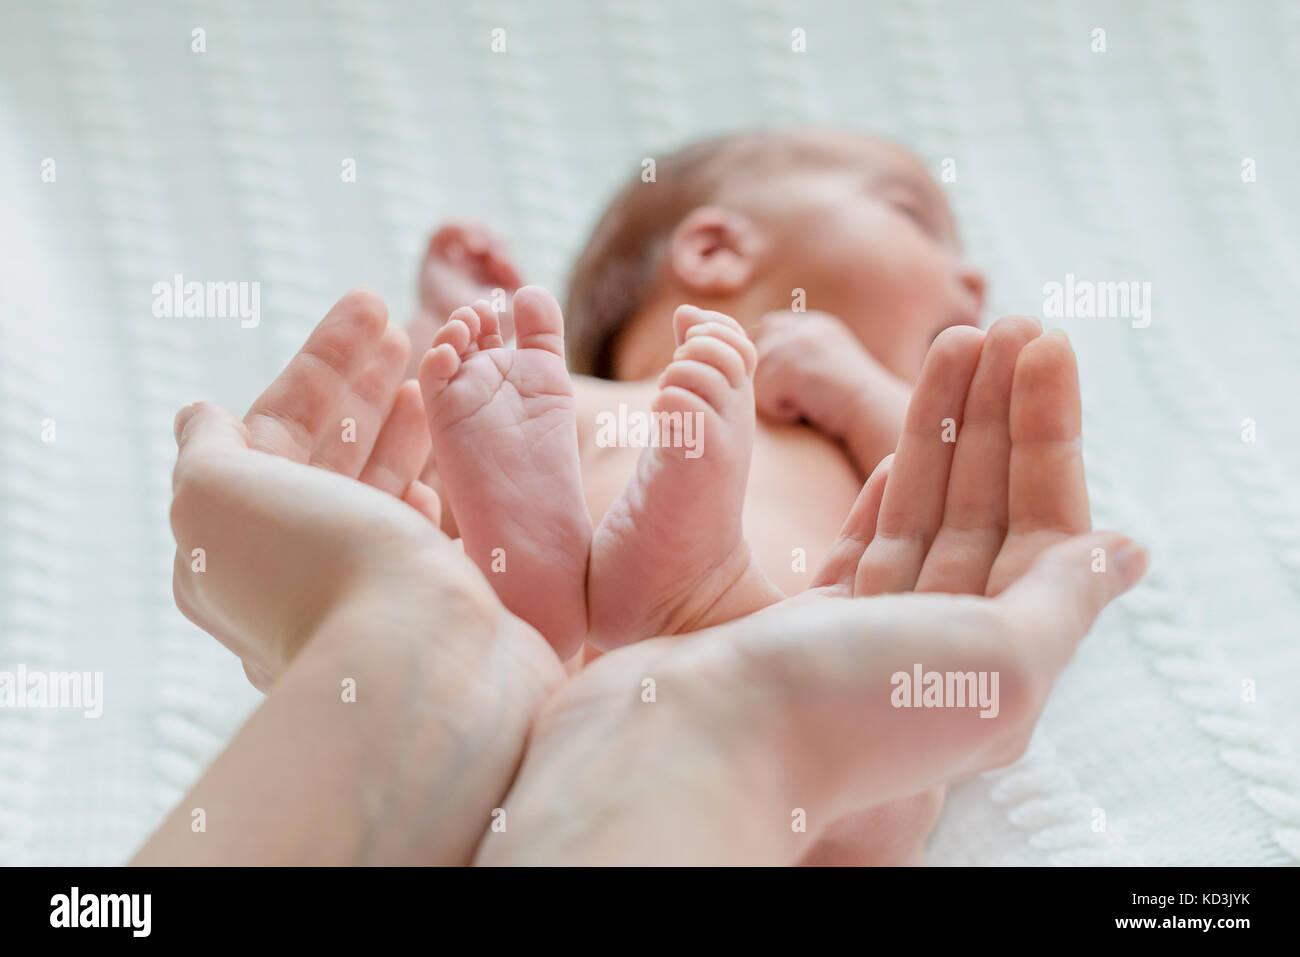 Baby hands Photo Stock